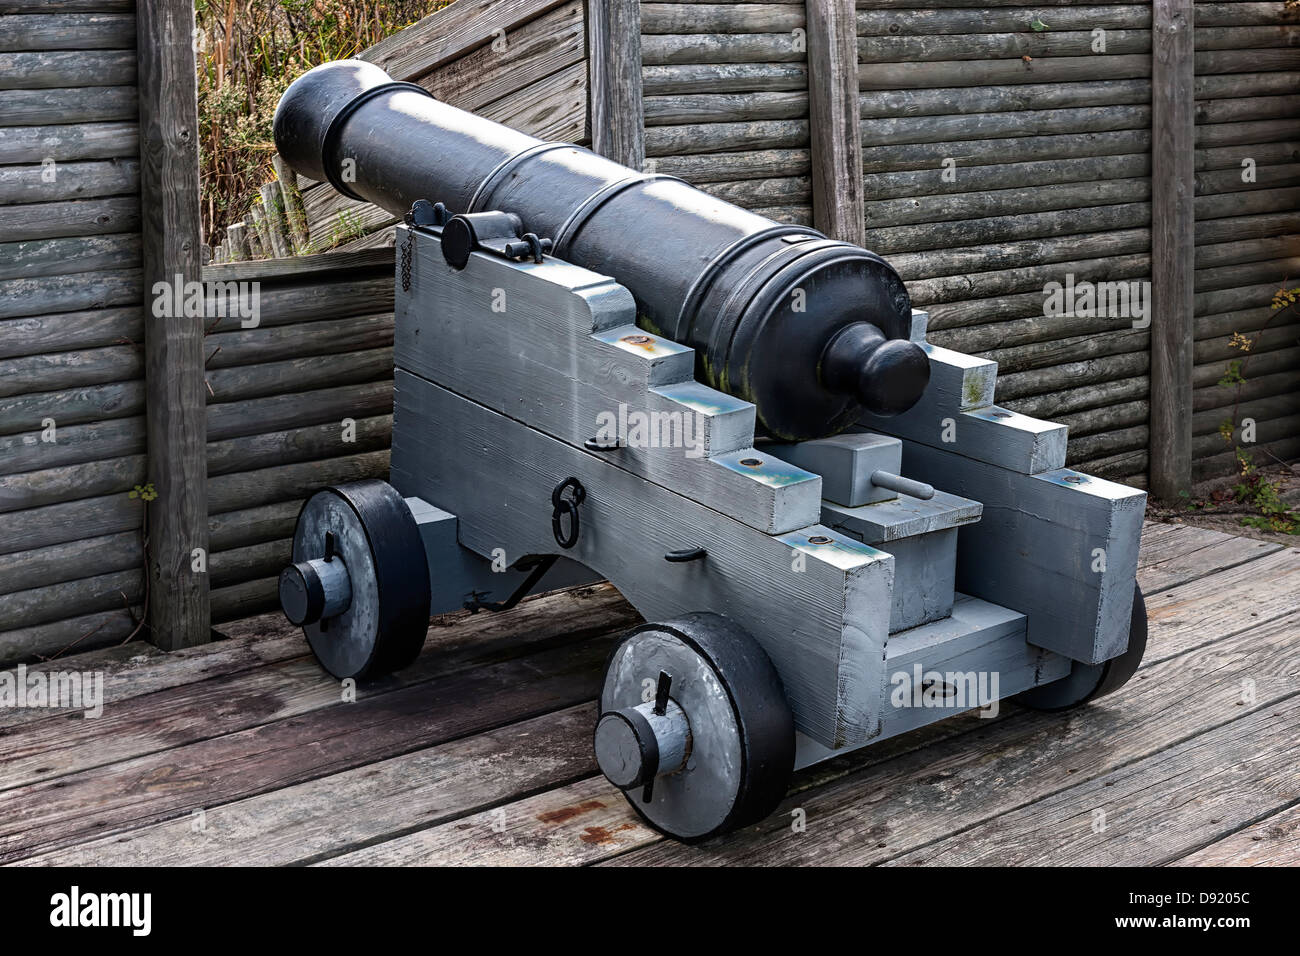 Una pistola emplacement a Fort King George, Darien Georgia Immagini Stock